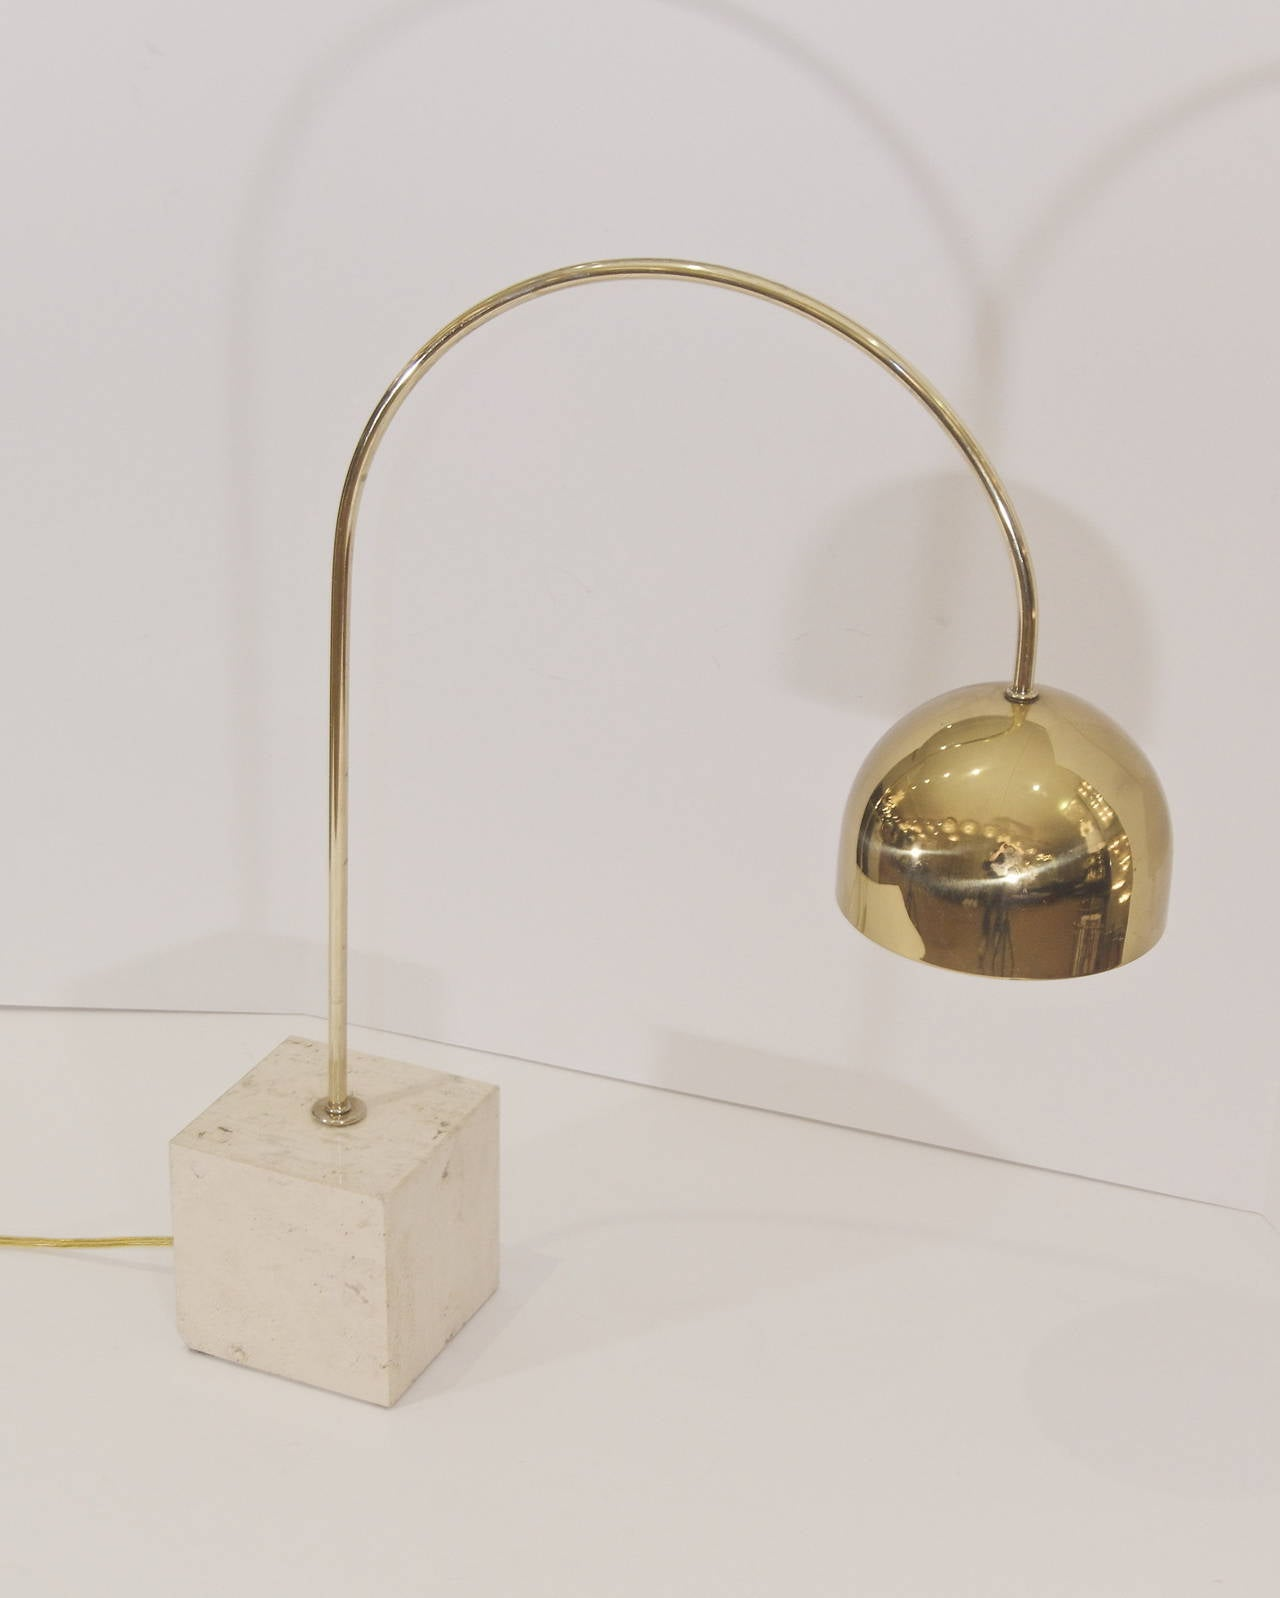 Italian Guzzini Brass Arc Table Lamp With Travertine Base For Sale